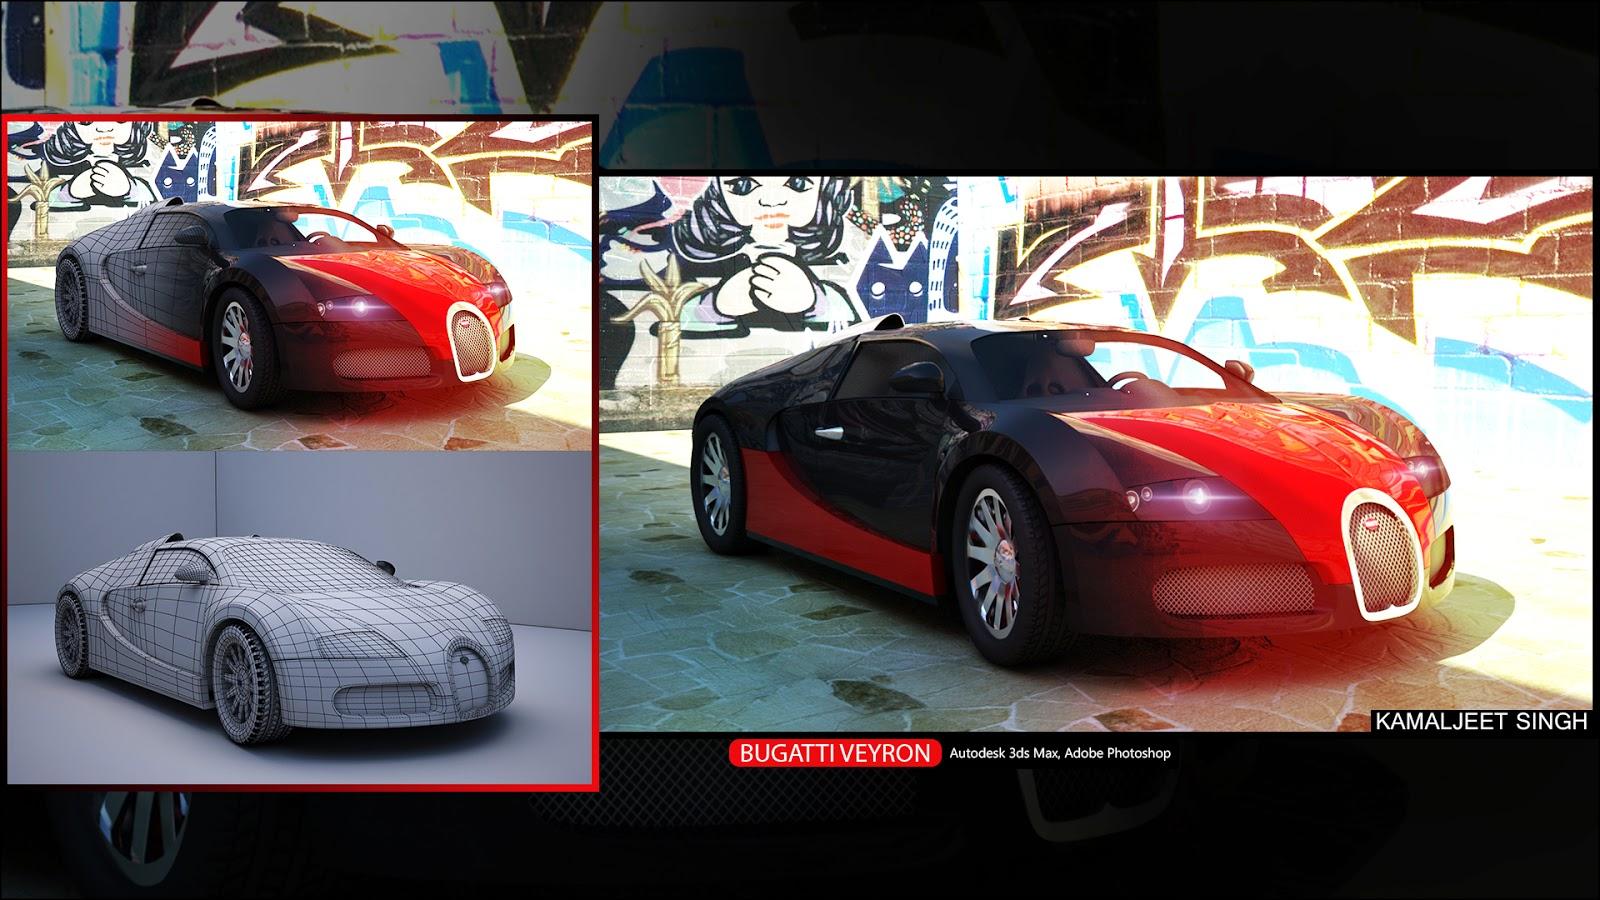 Bugatti Veyron 3d model in Autodesk 3ds Max & Adobe Photoshop